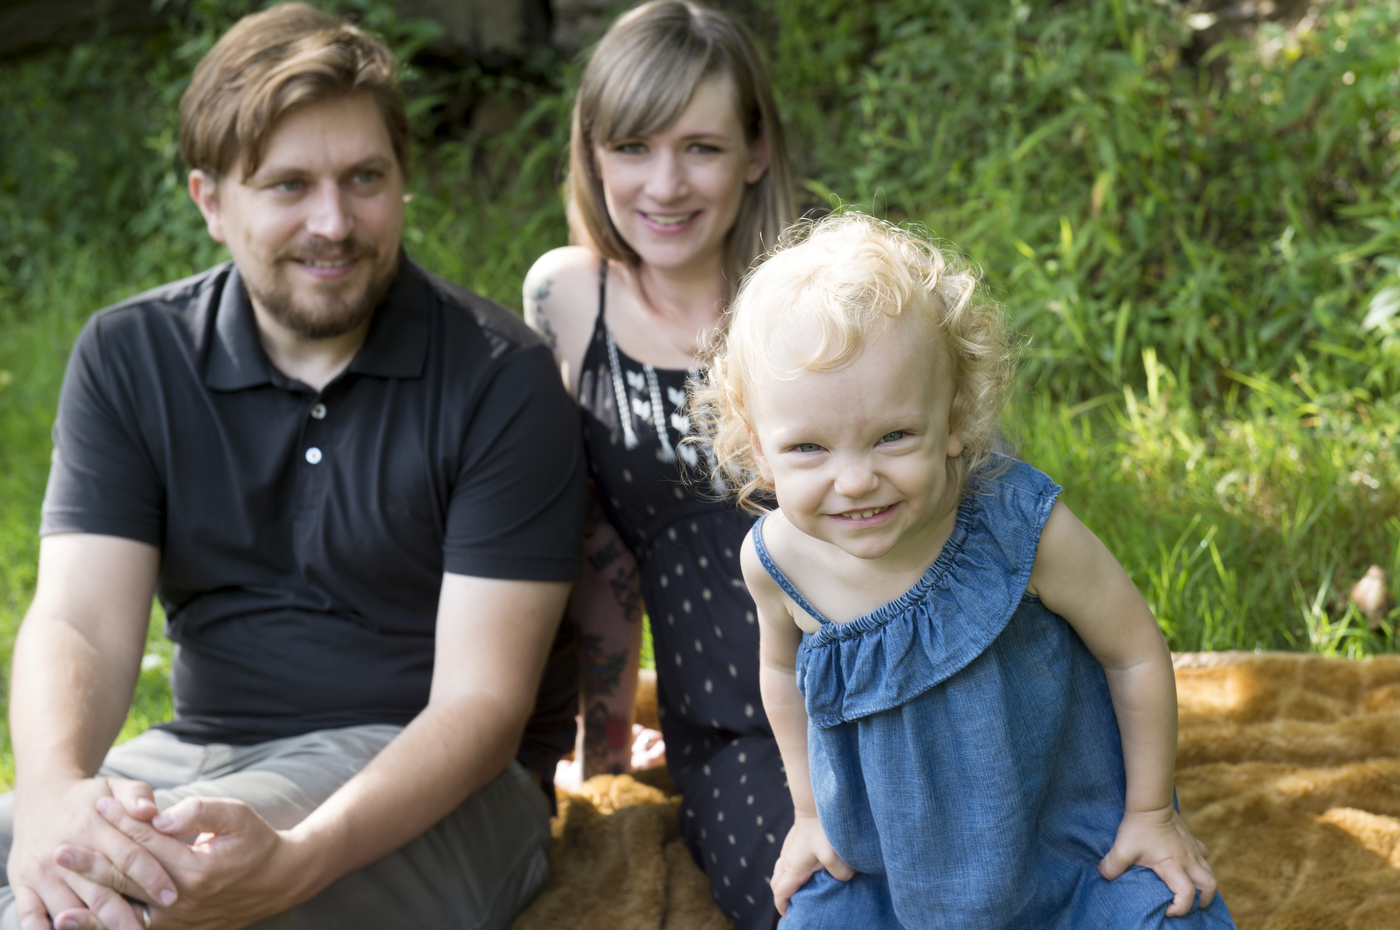 081416_Martin&Kelly&Alice&Baby_blog_71.JPG